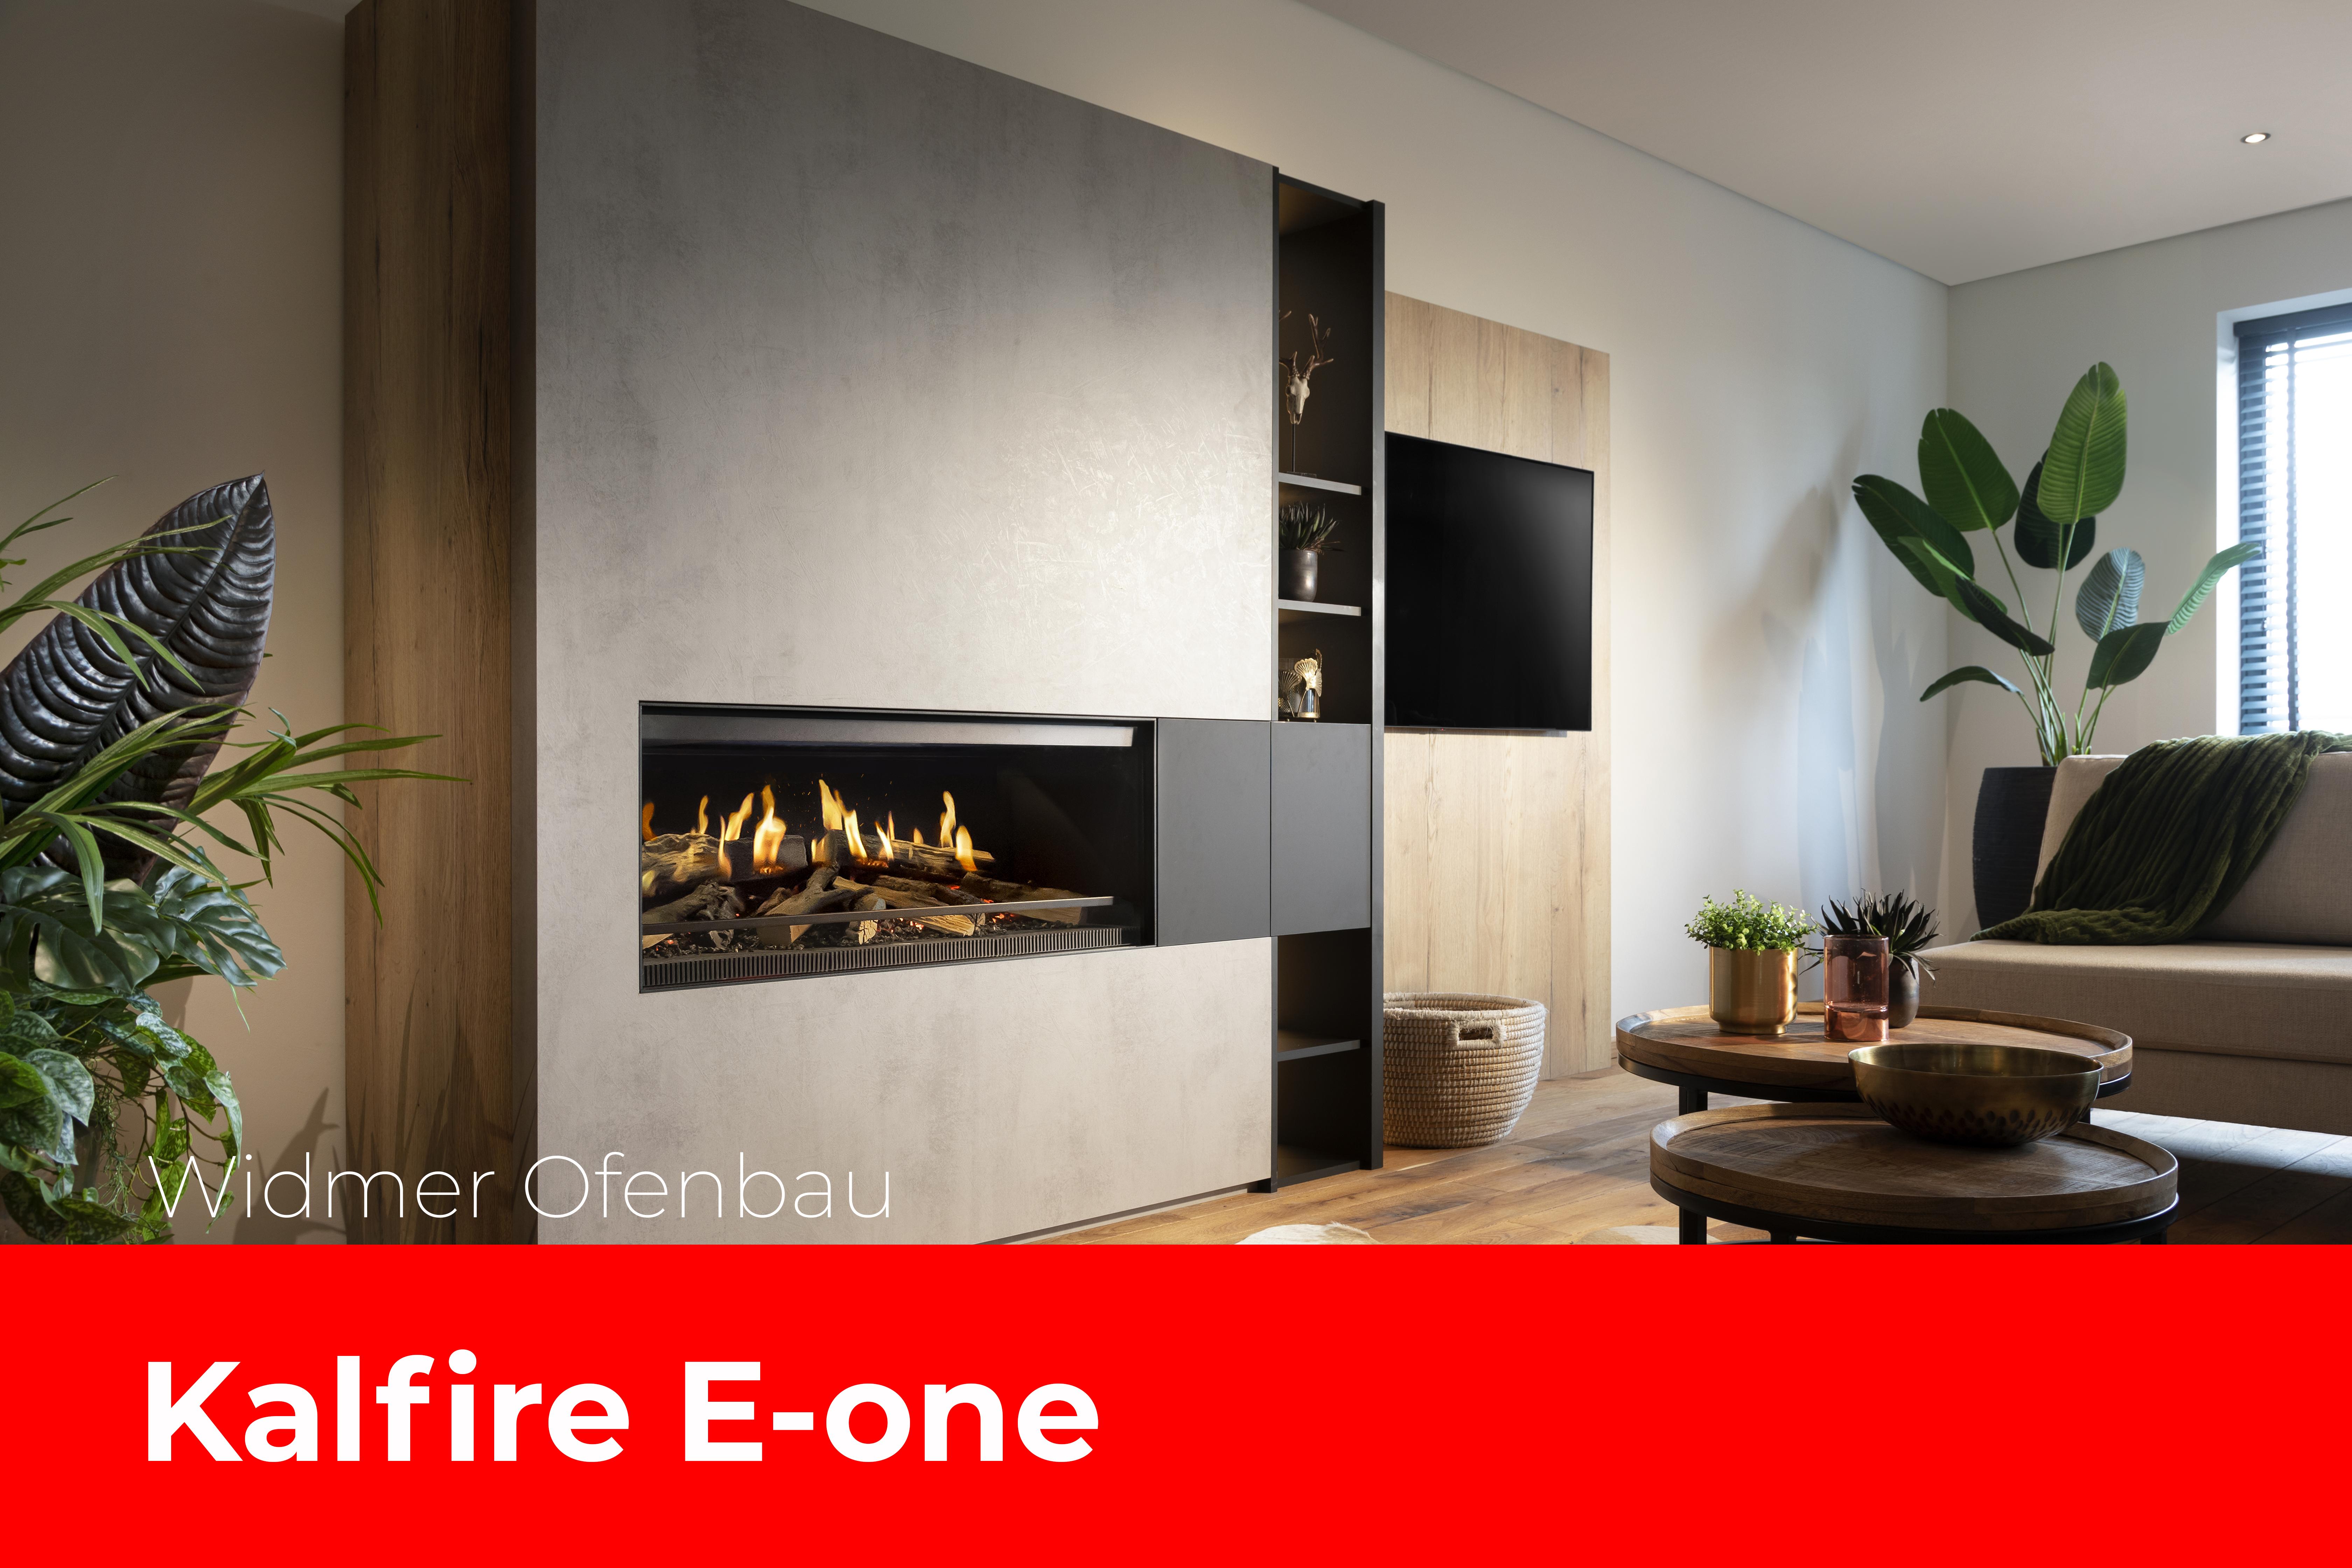 Kalfire e-one F Schrankwand